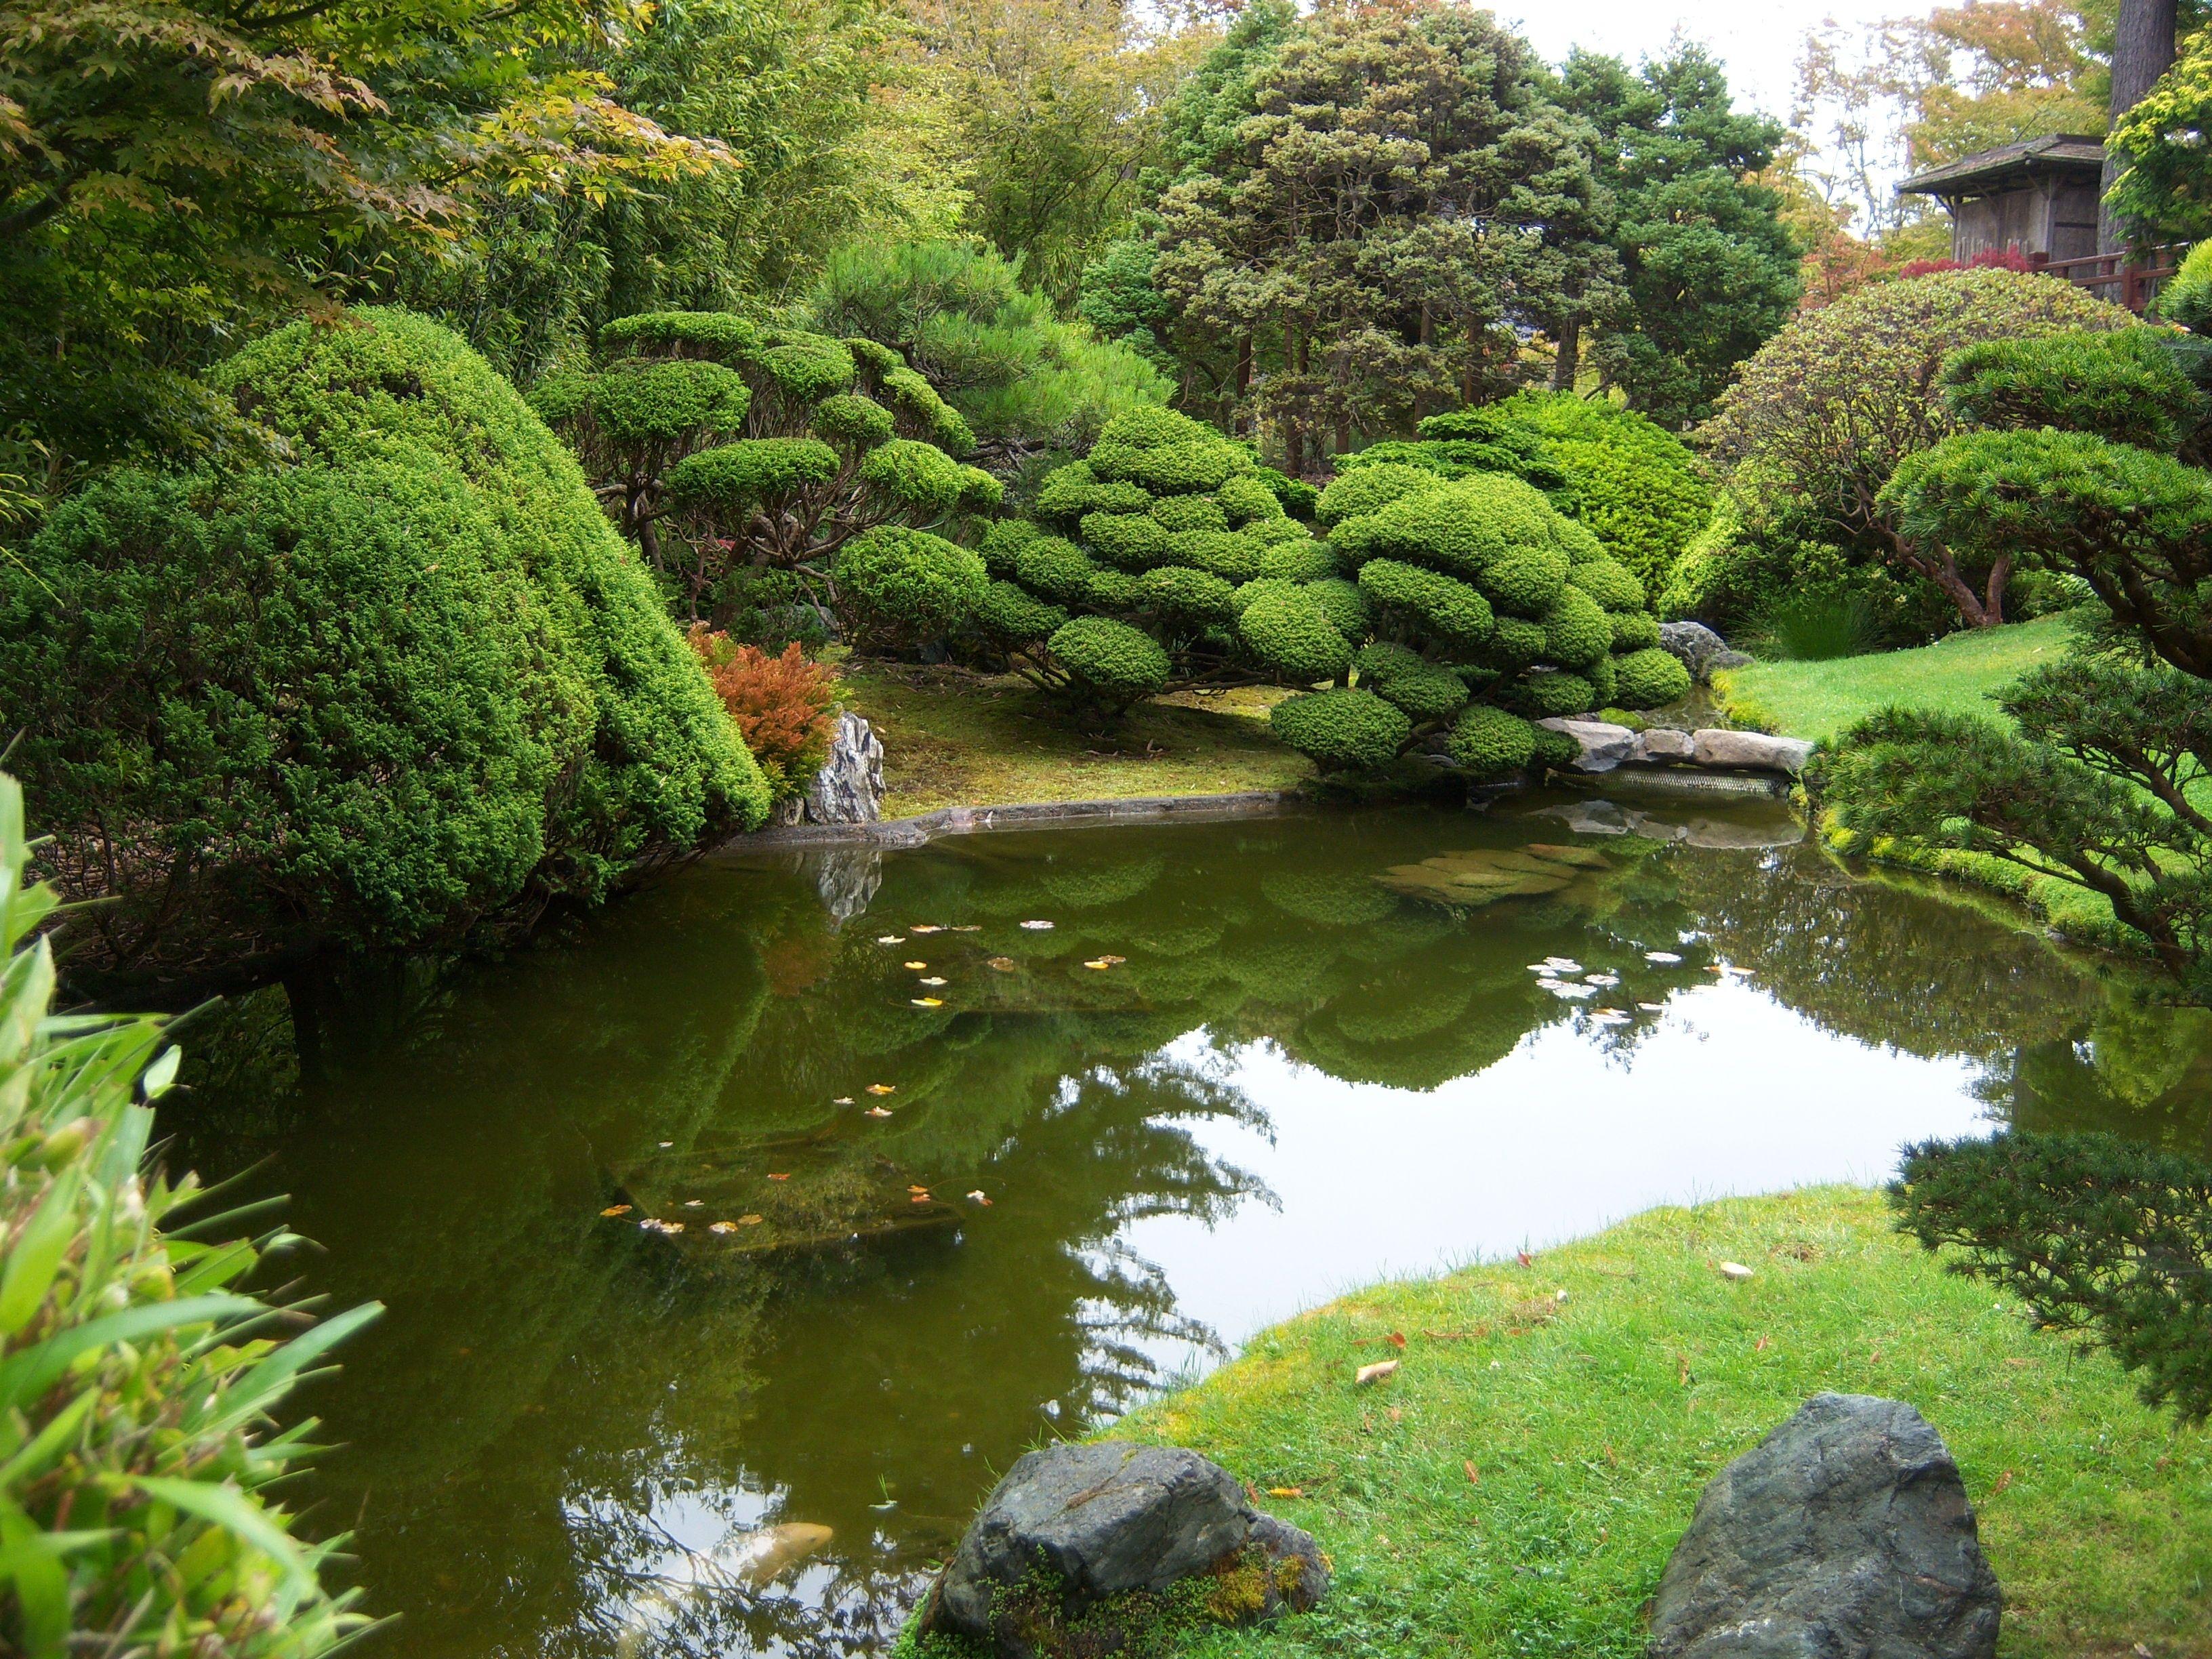 Japanese Tea Gardens in Golden Gate Park, San Francisco